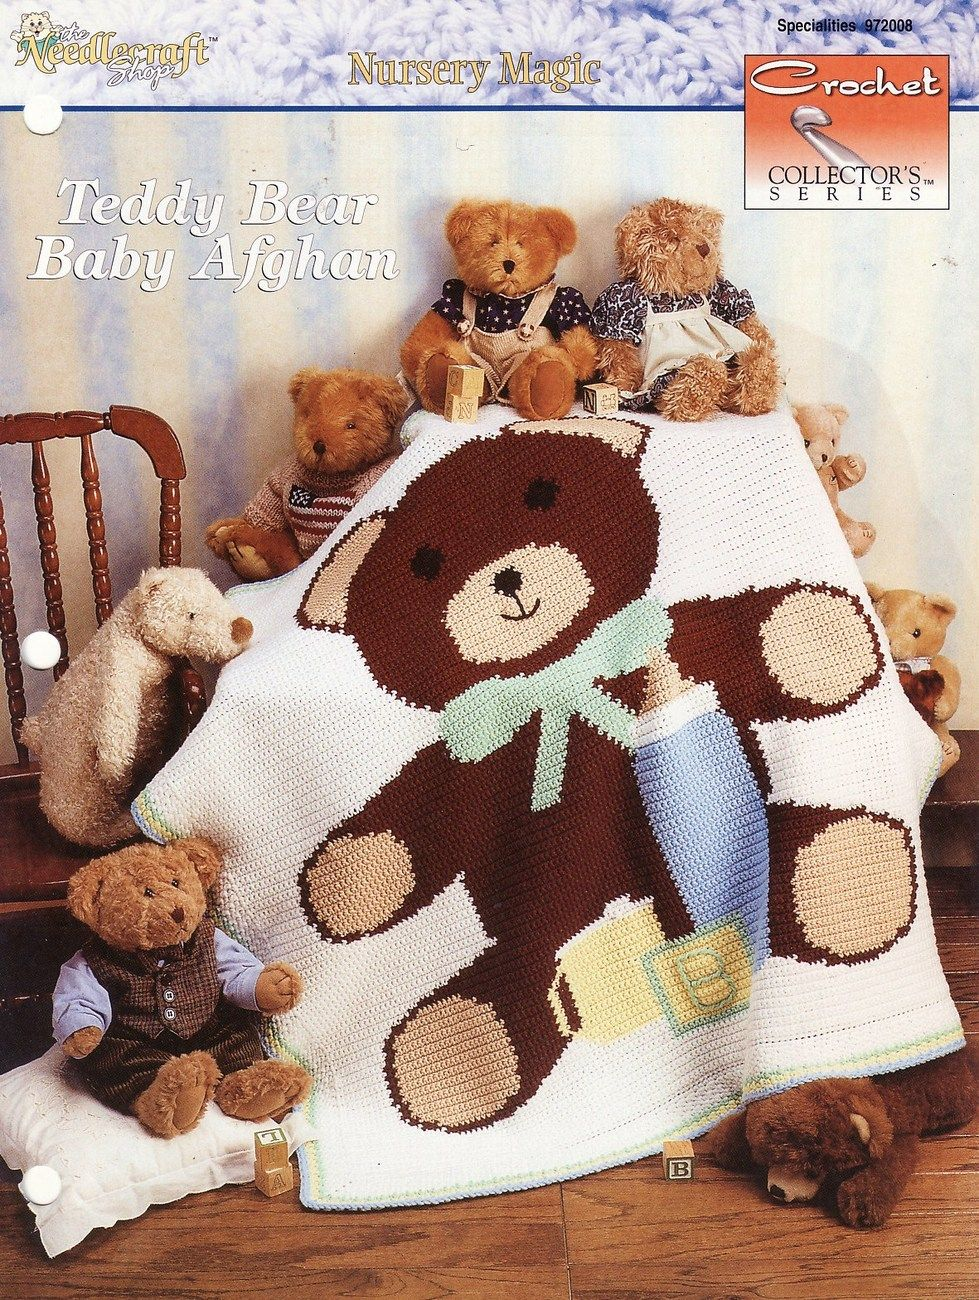 Teddy Bear Baby Afghan Crochet Pattern Blanket Infants Shower Gift ...